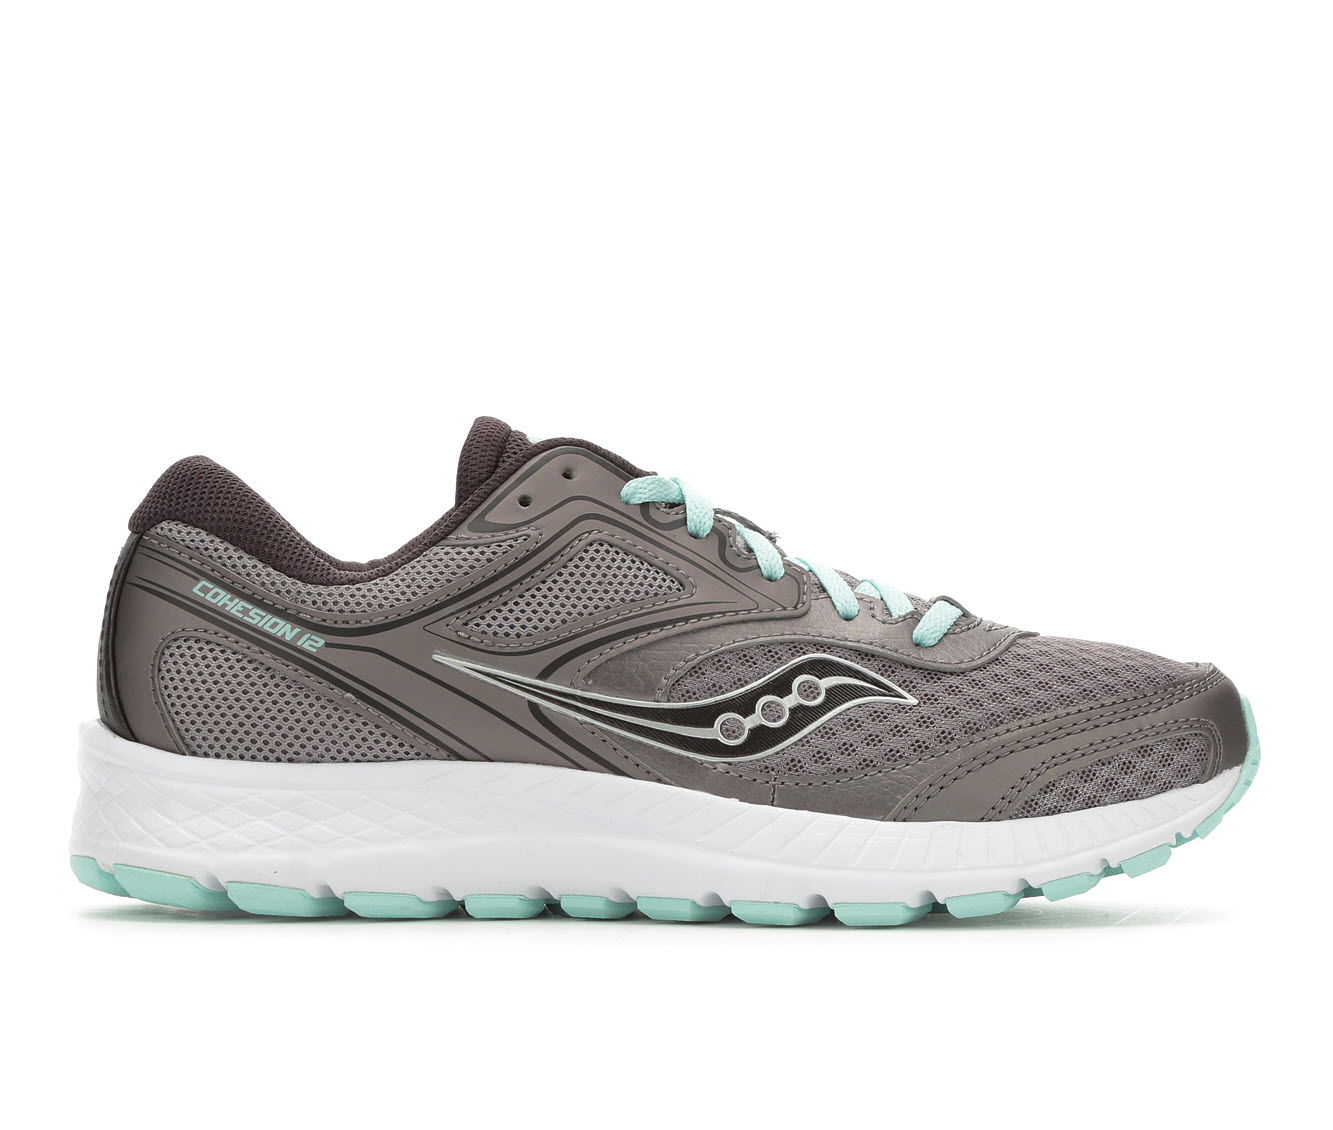 Saucony Cohesion 12 Women's Athletic Shoe (Gray)